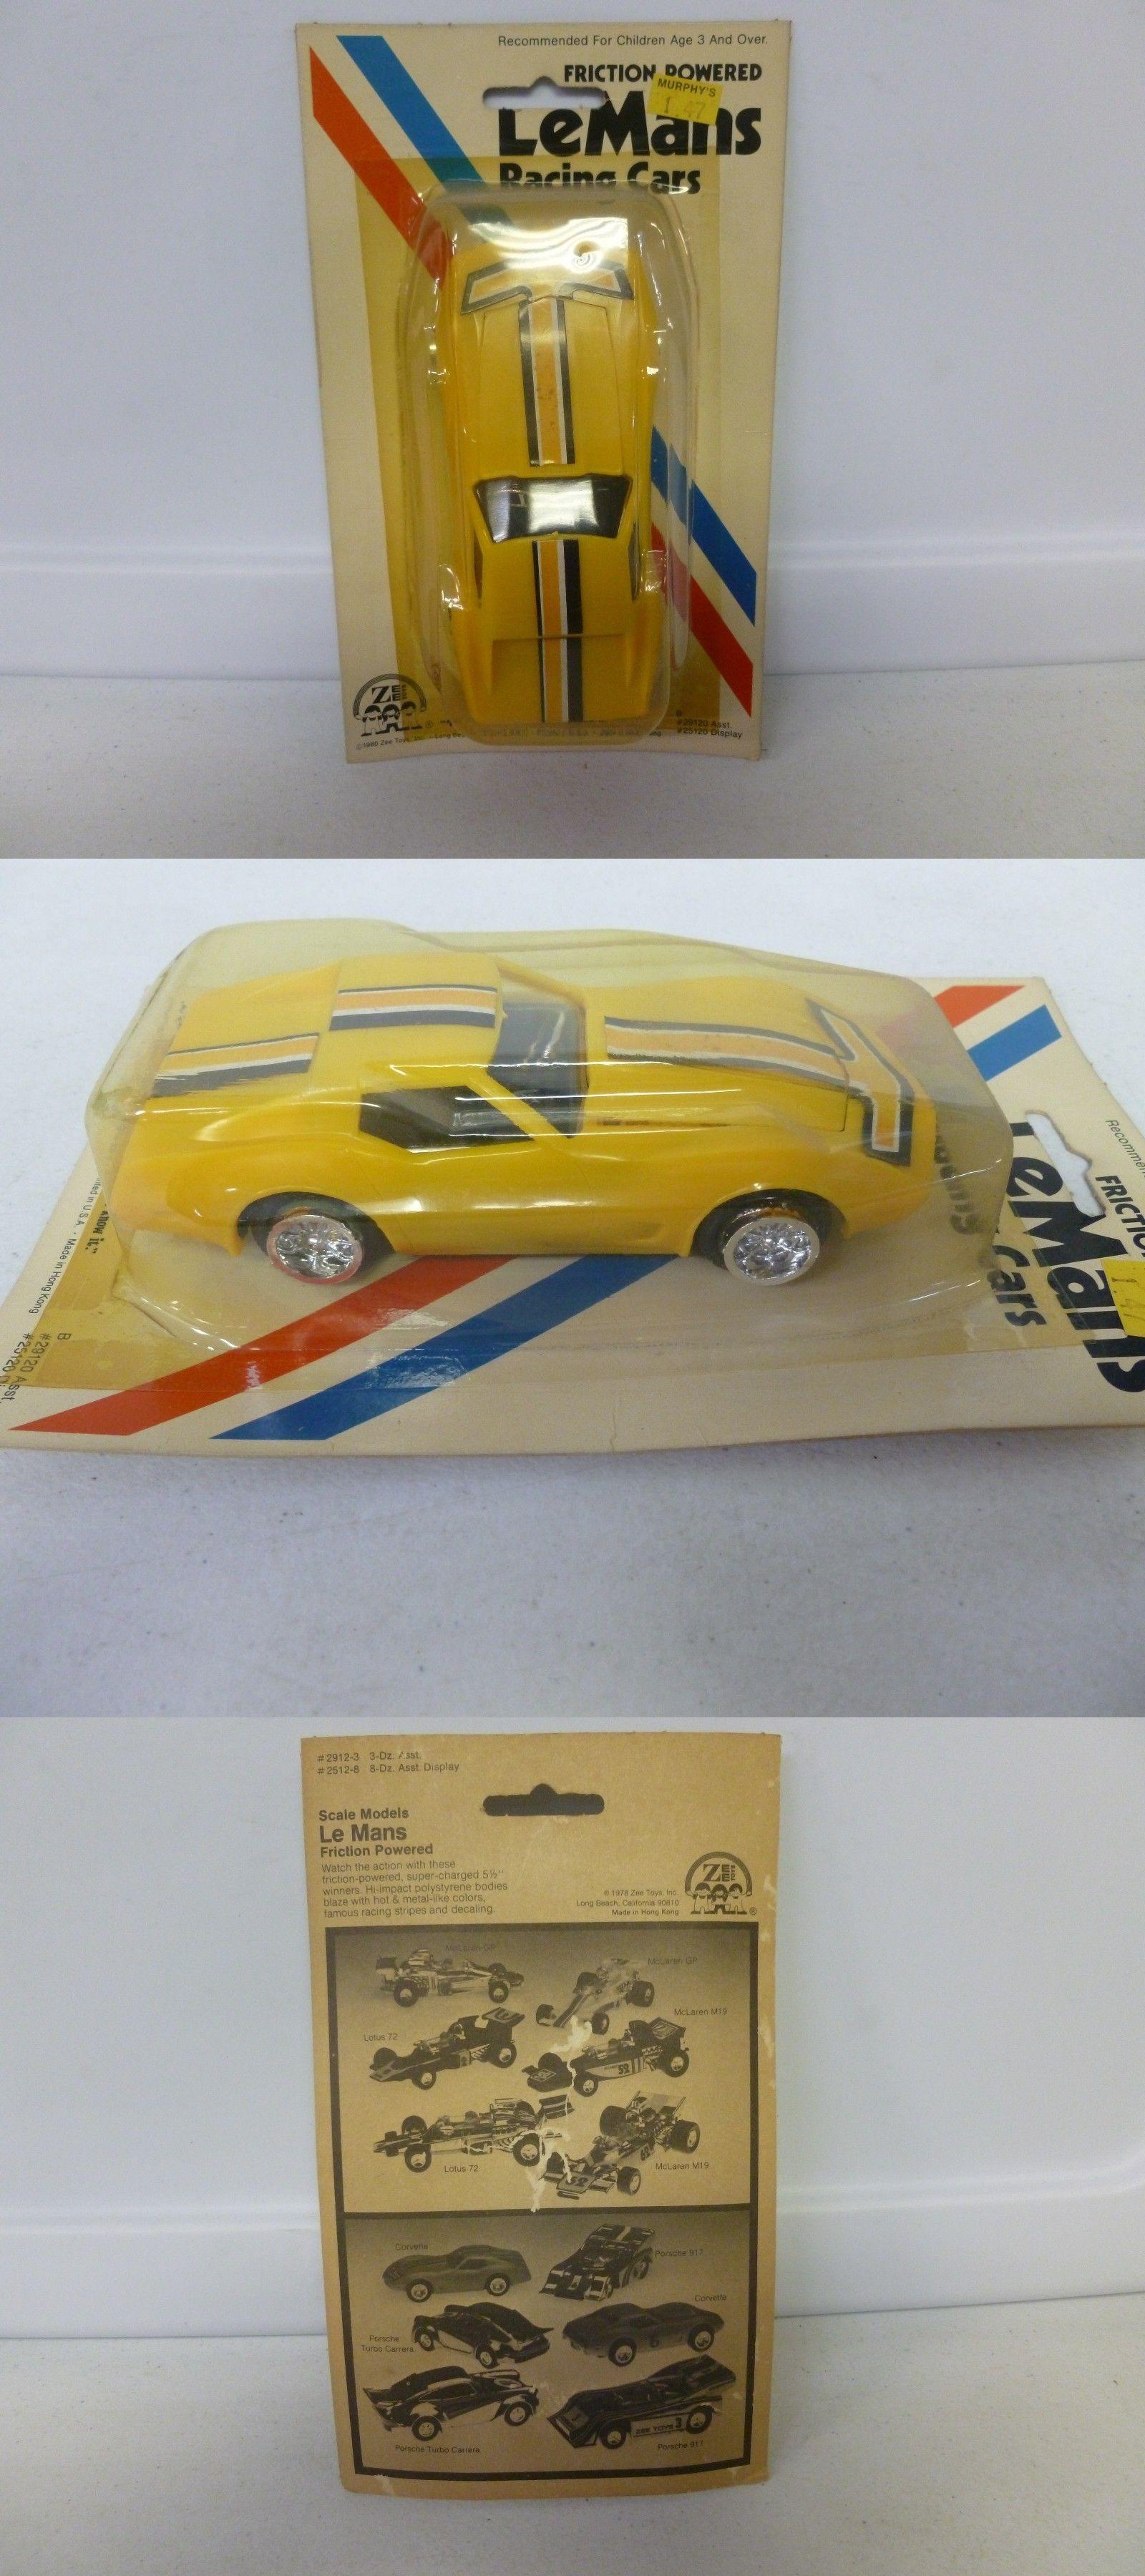 Cars 3 toys racers  Vintage  Zee Toys Friction Powered LeMans Racing Car Corvette